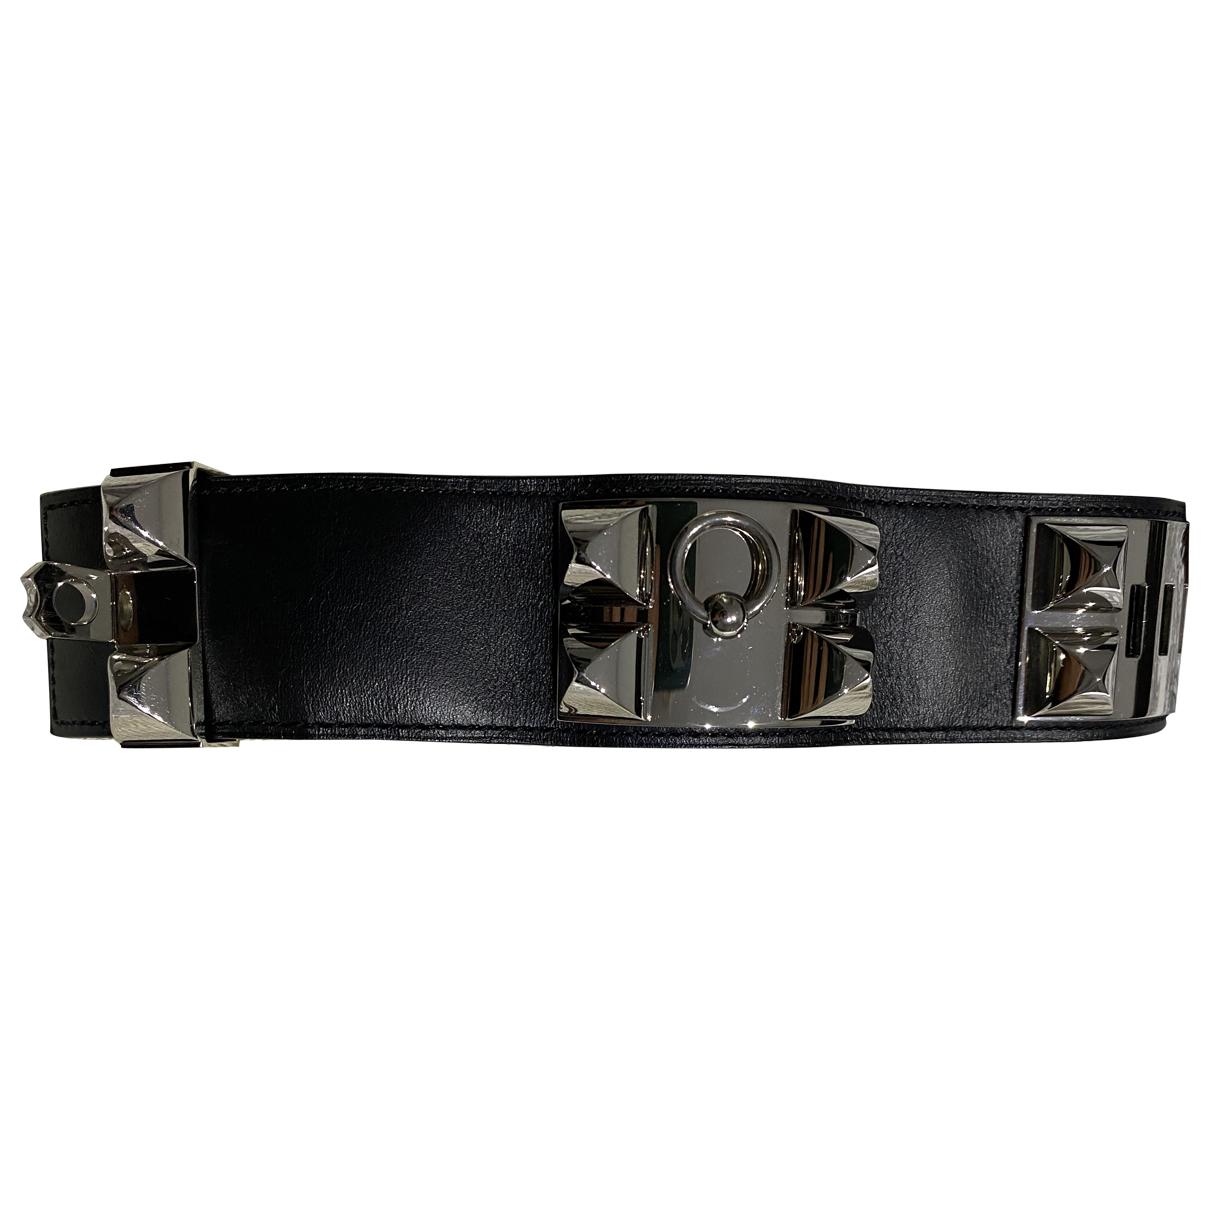 Hermes Collier de chien  Armband in  Schwarz Leder